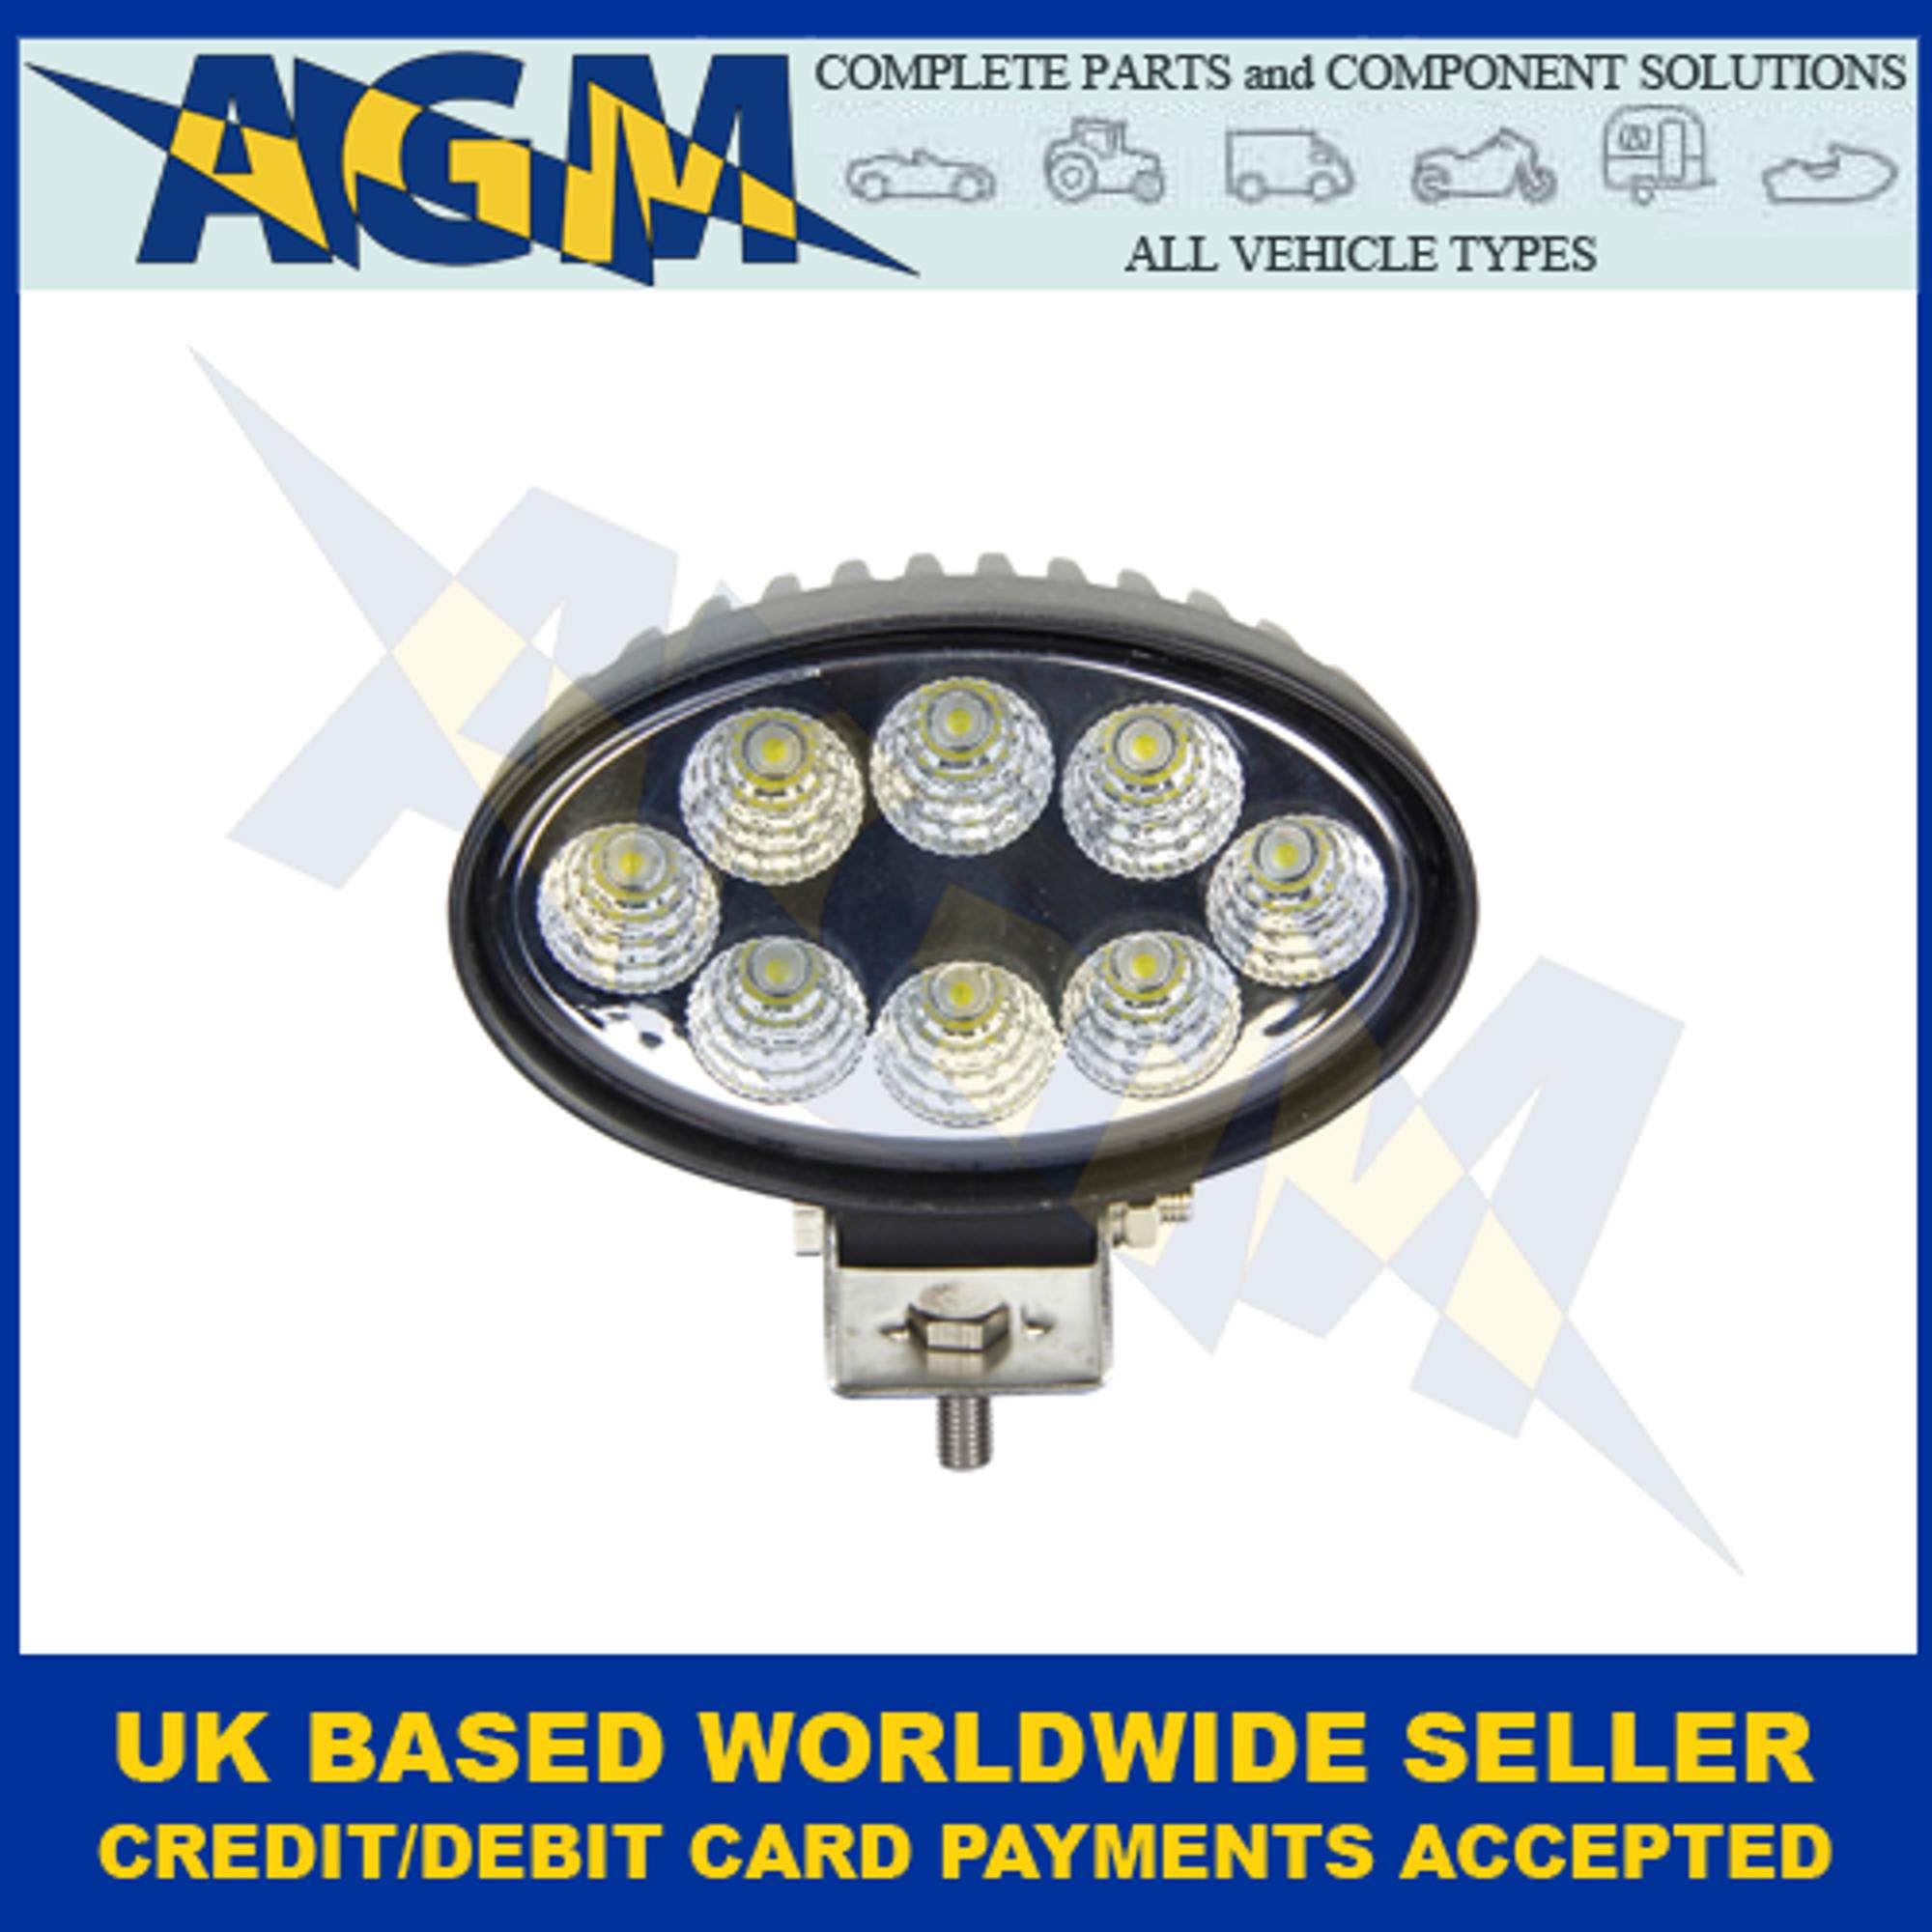 High Worksearch John Autolamps 1224v 24w Led Power Deere 8424bm Lamp dCoWxBeQrE